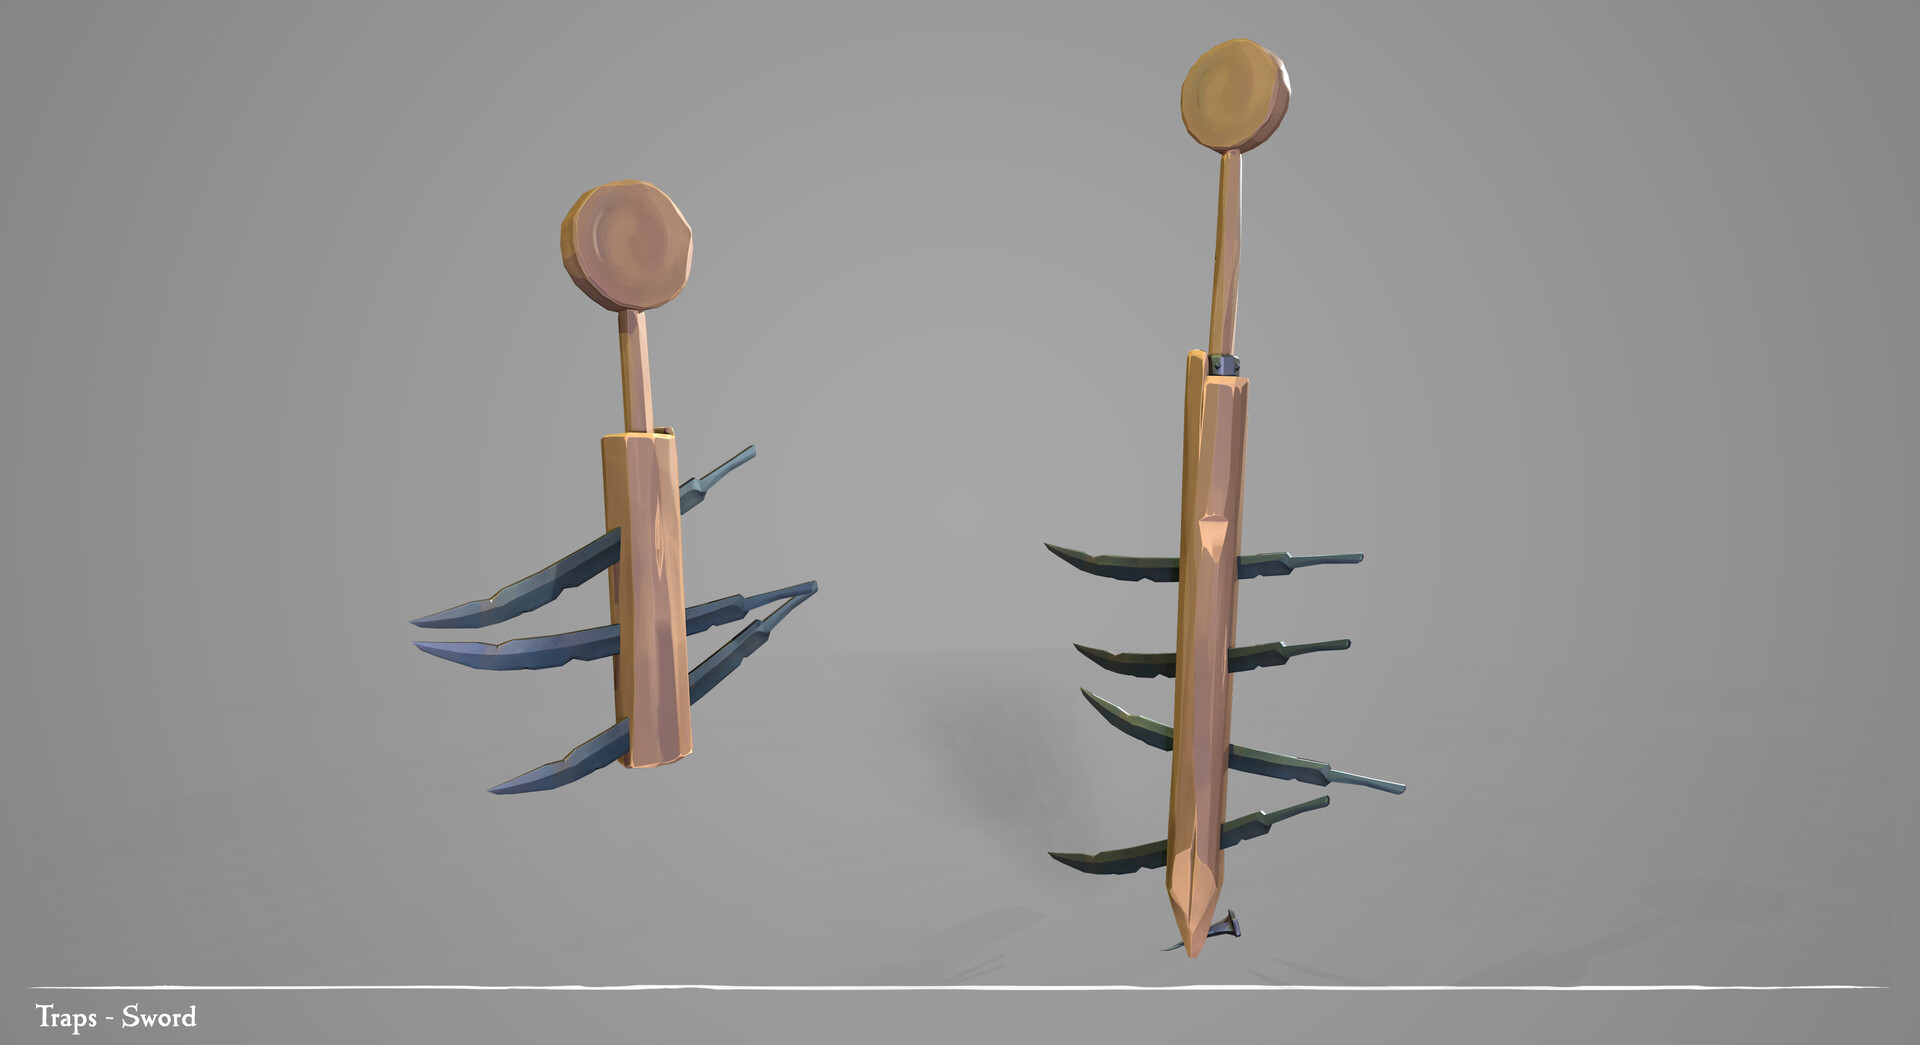 george-o-keeffe-15-sot-traps-sword.jpg